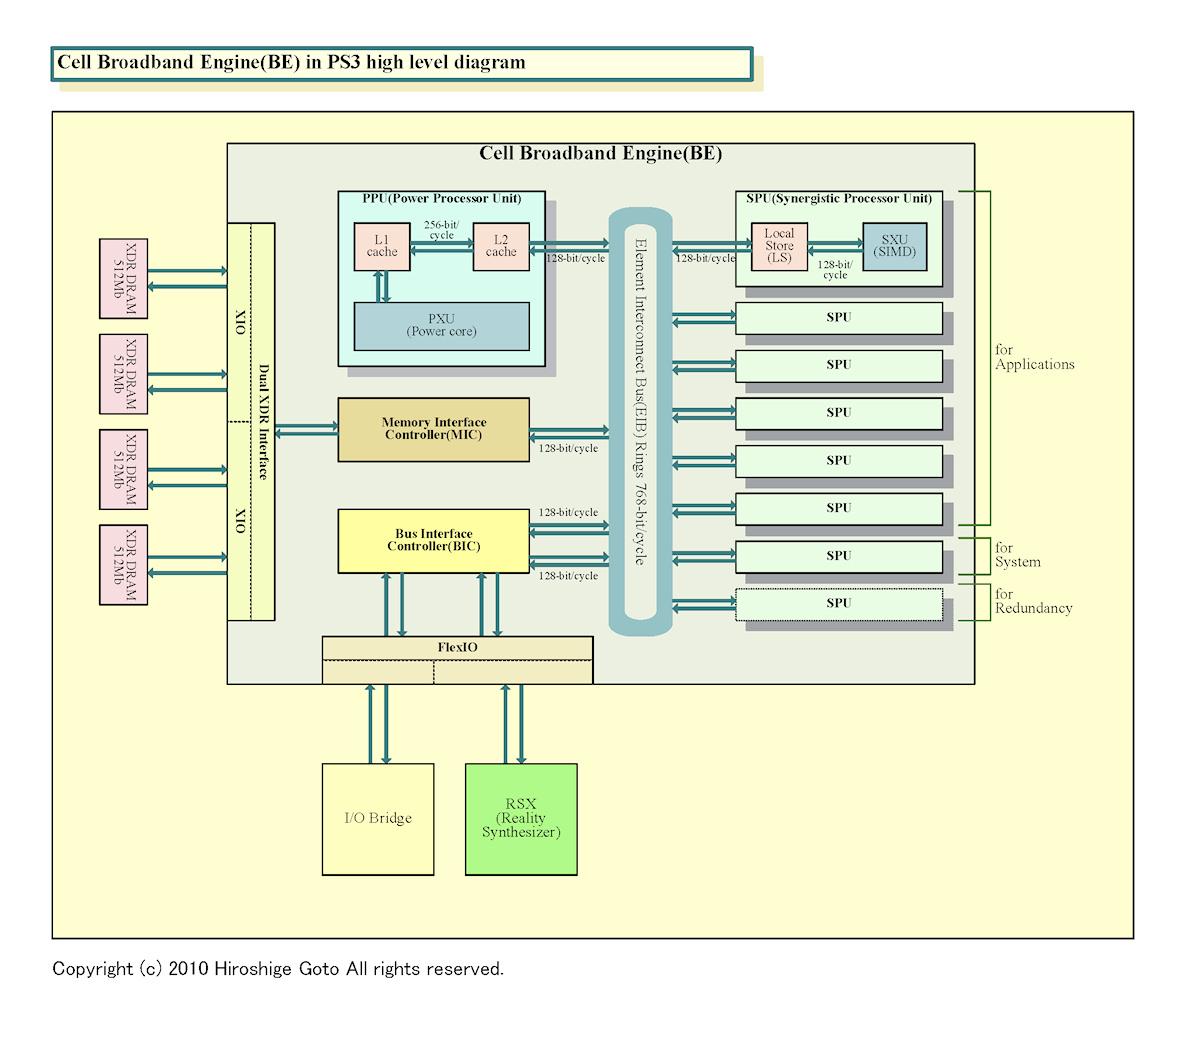 "PS3 CPUのダイアグラム<br>※PDF版は<a href=""/video/pcw/docs/393/425/03.pdf"" ipw_id=""881656"" ipw_linktype=""filelink_raw"">こちら</a>"